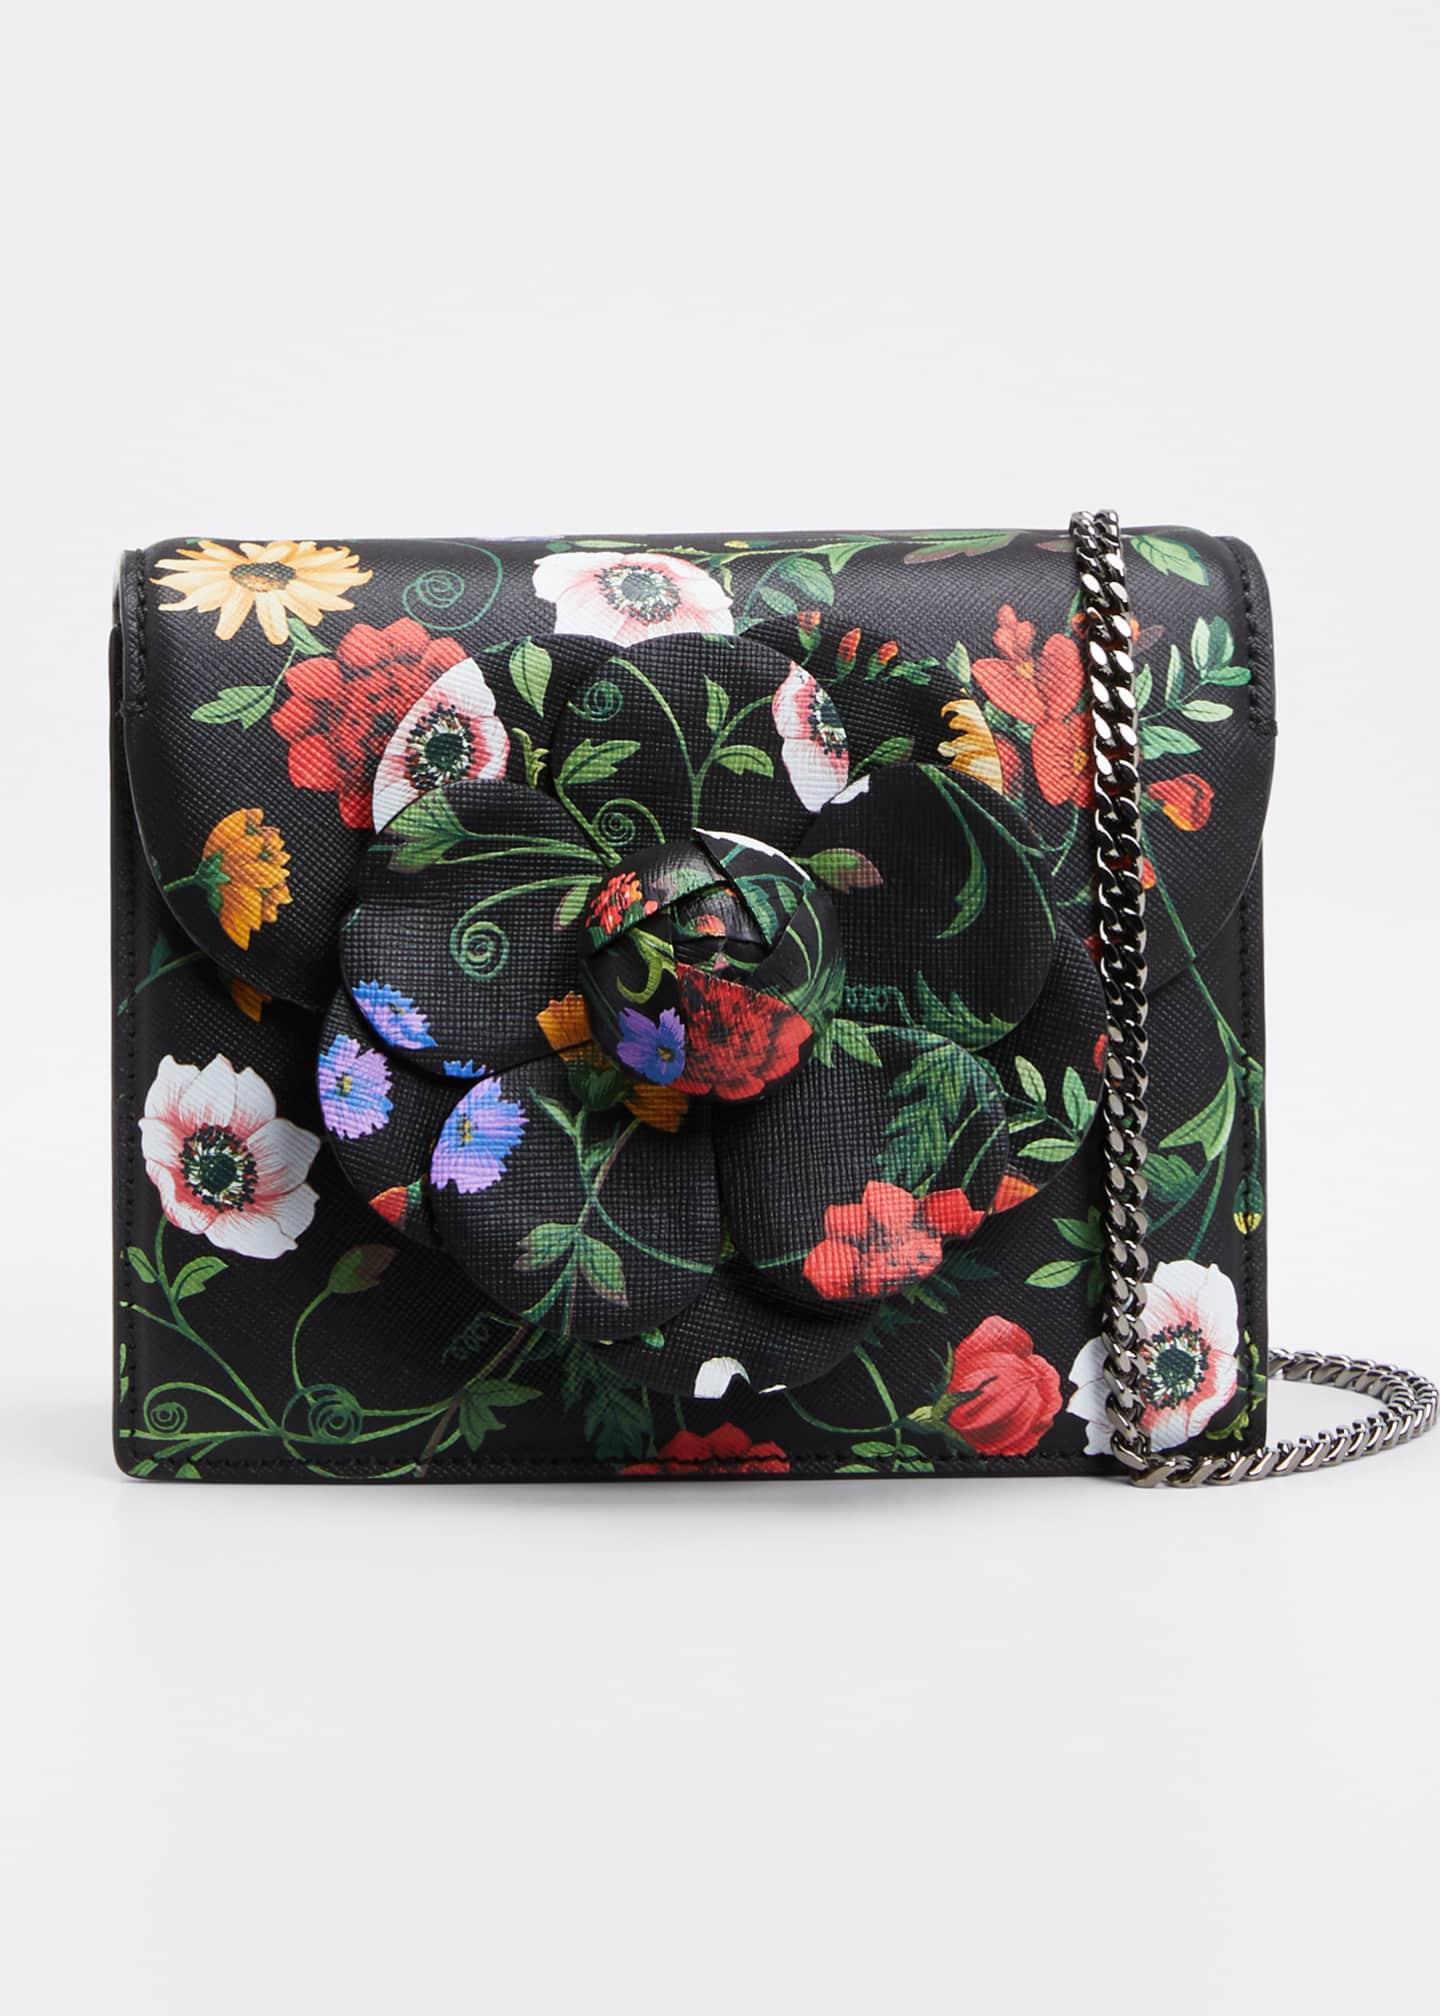 Oscar de la Renta Mini Tro Floral-Print Leather